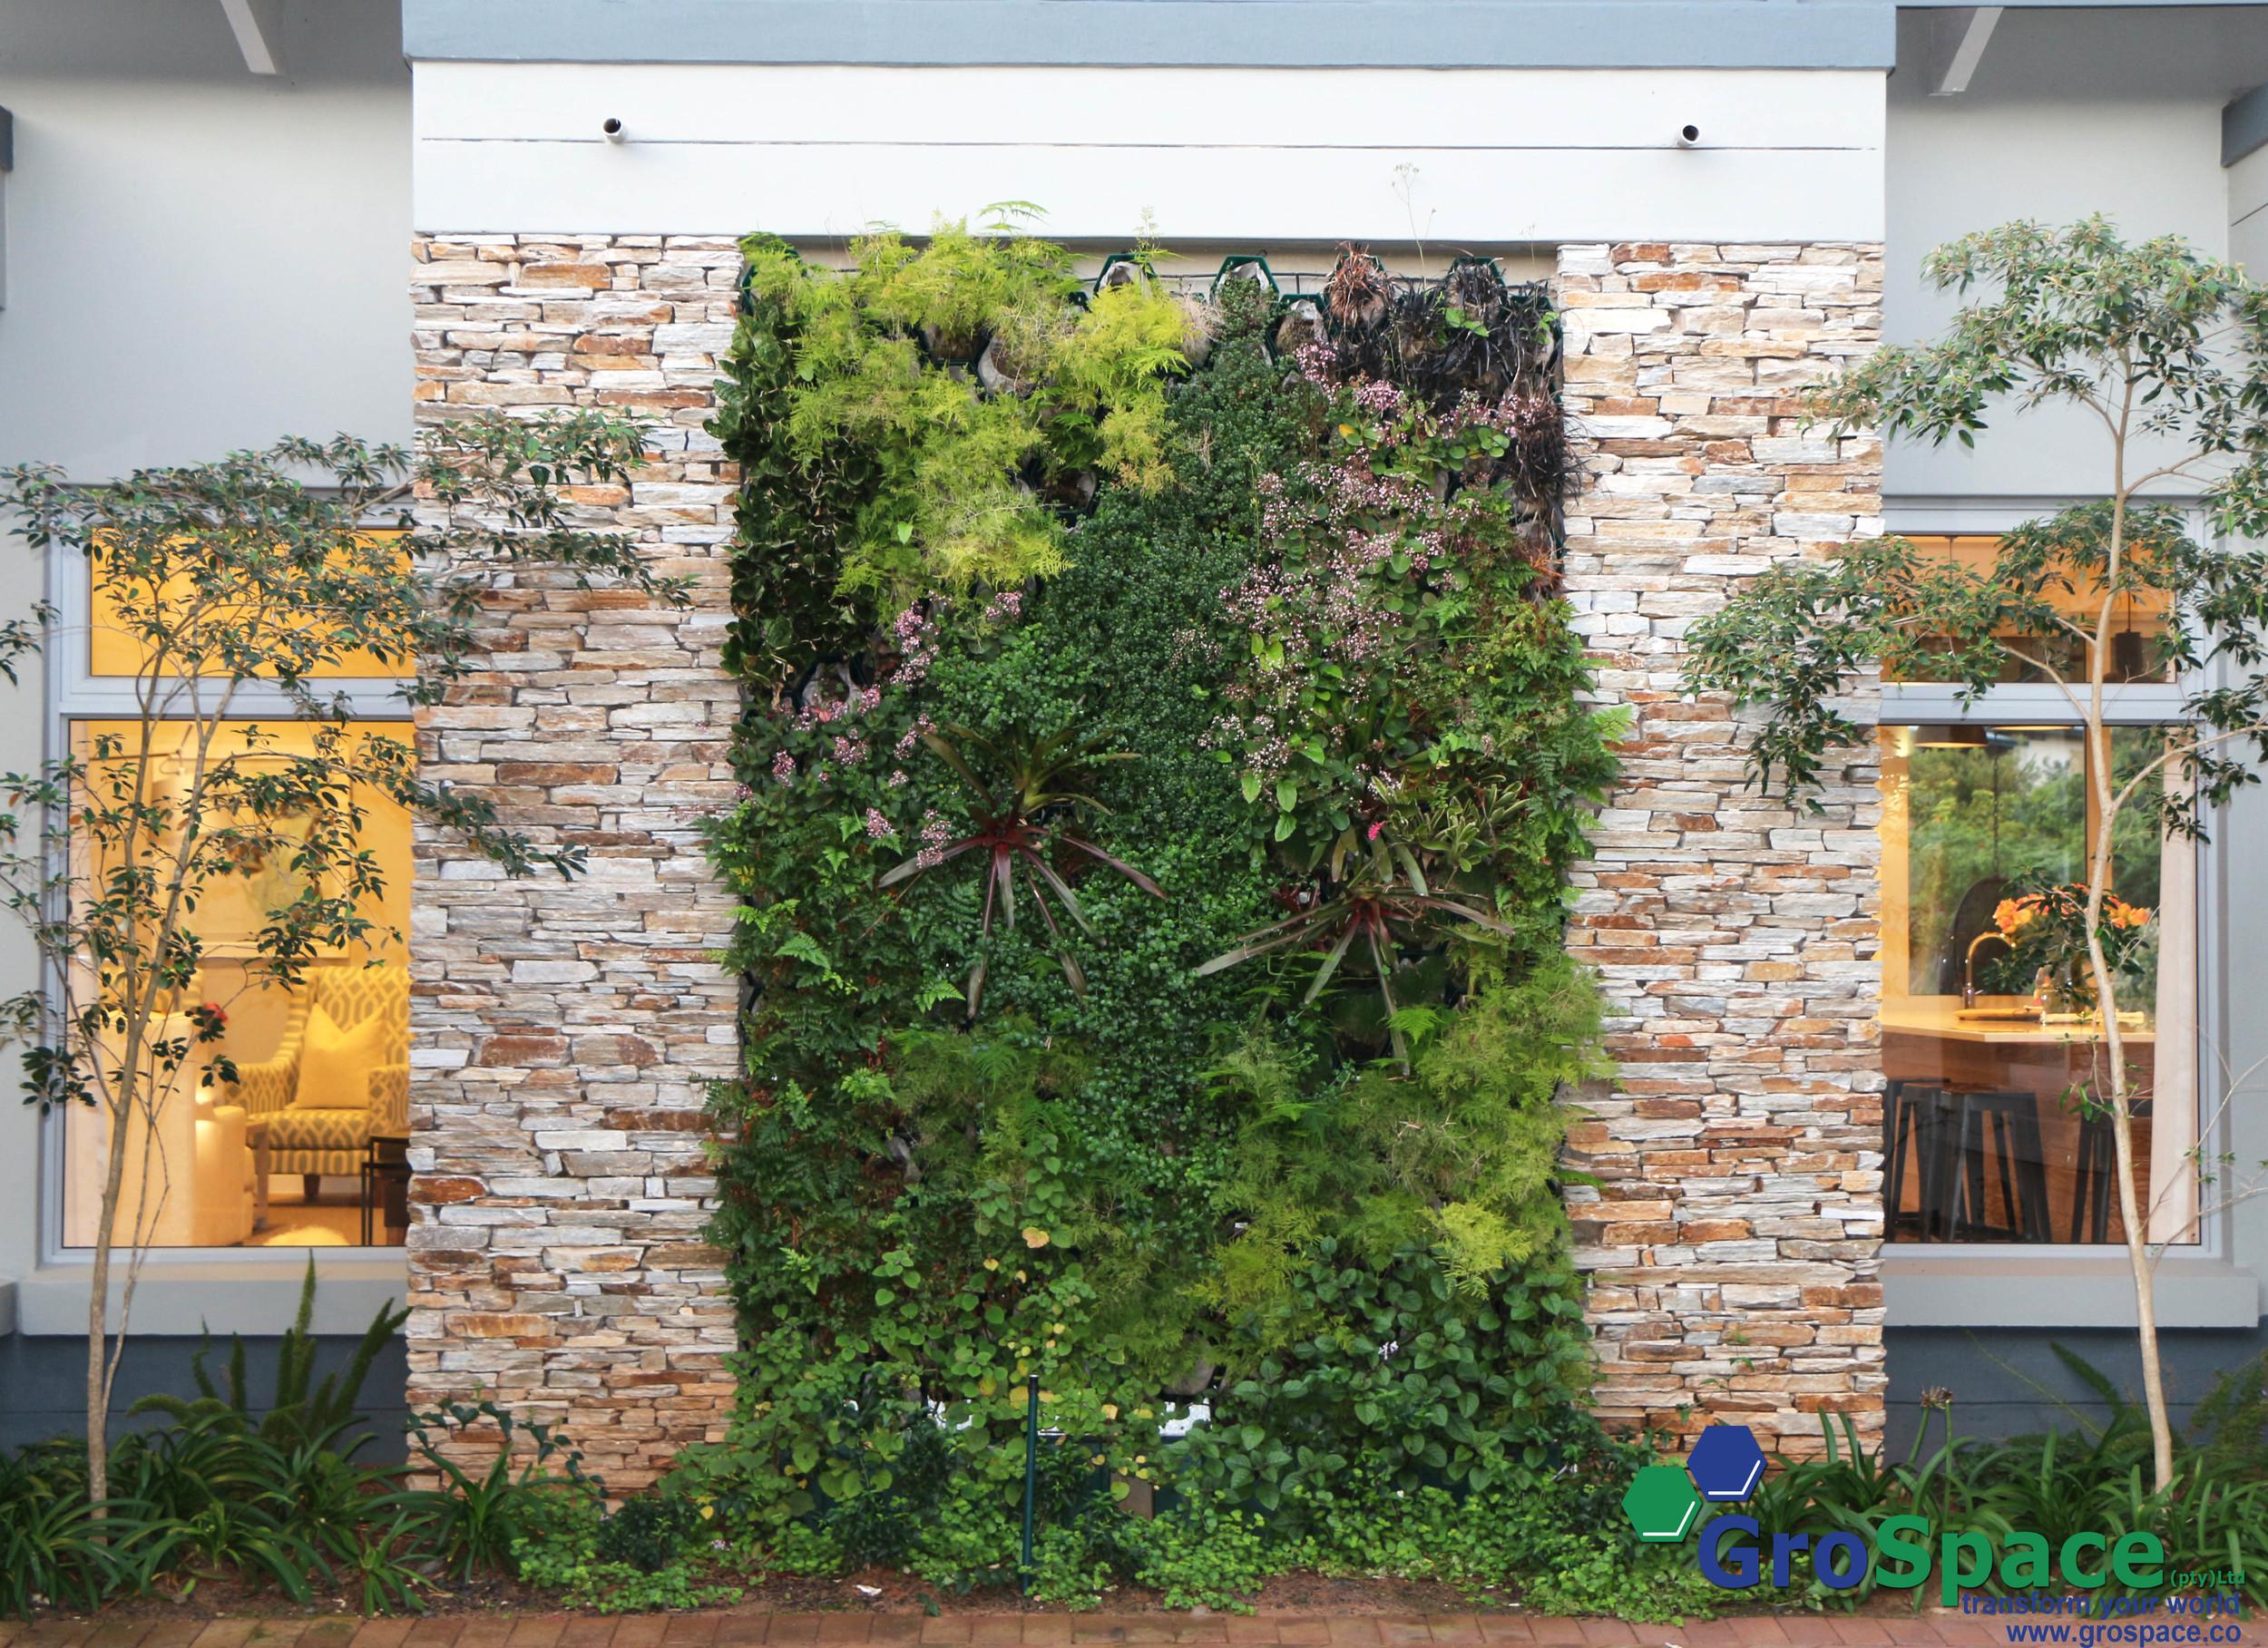 GorSpace vertical garden 5.jpg